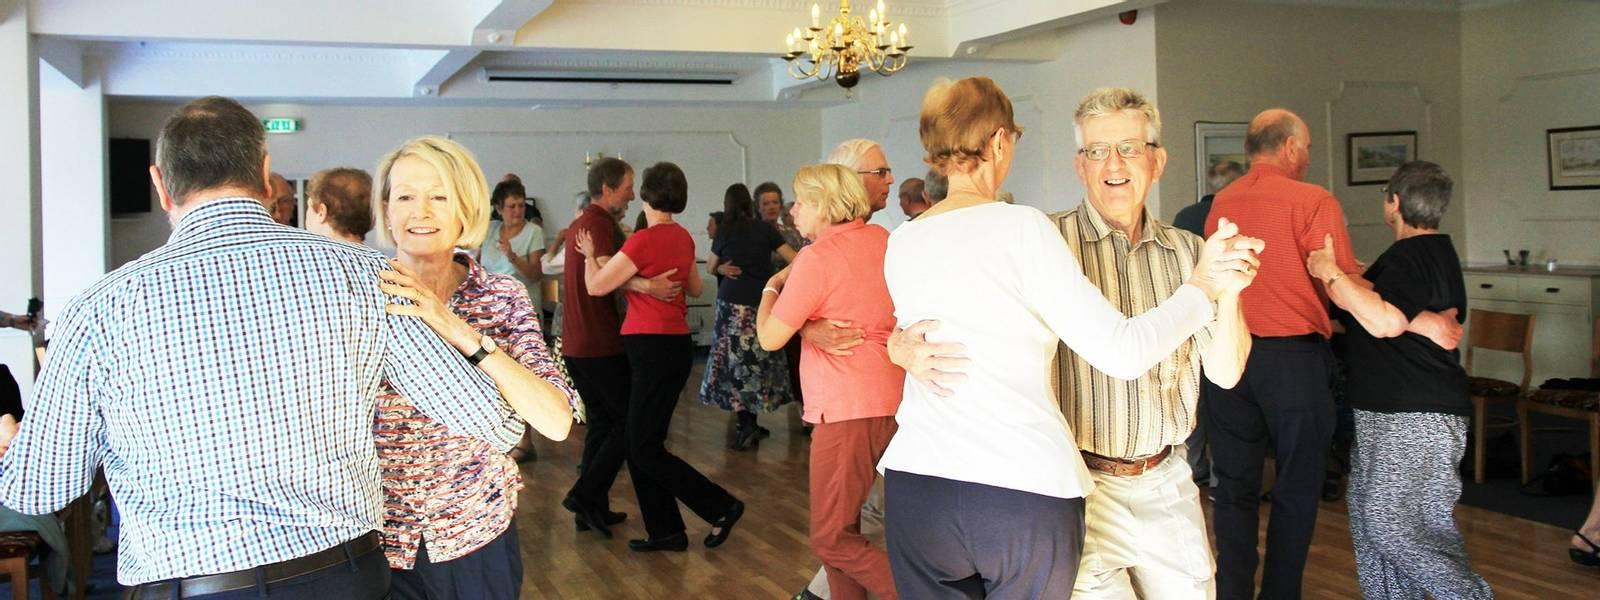 Dancing-FolkDancing-IMG_9369.JPG